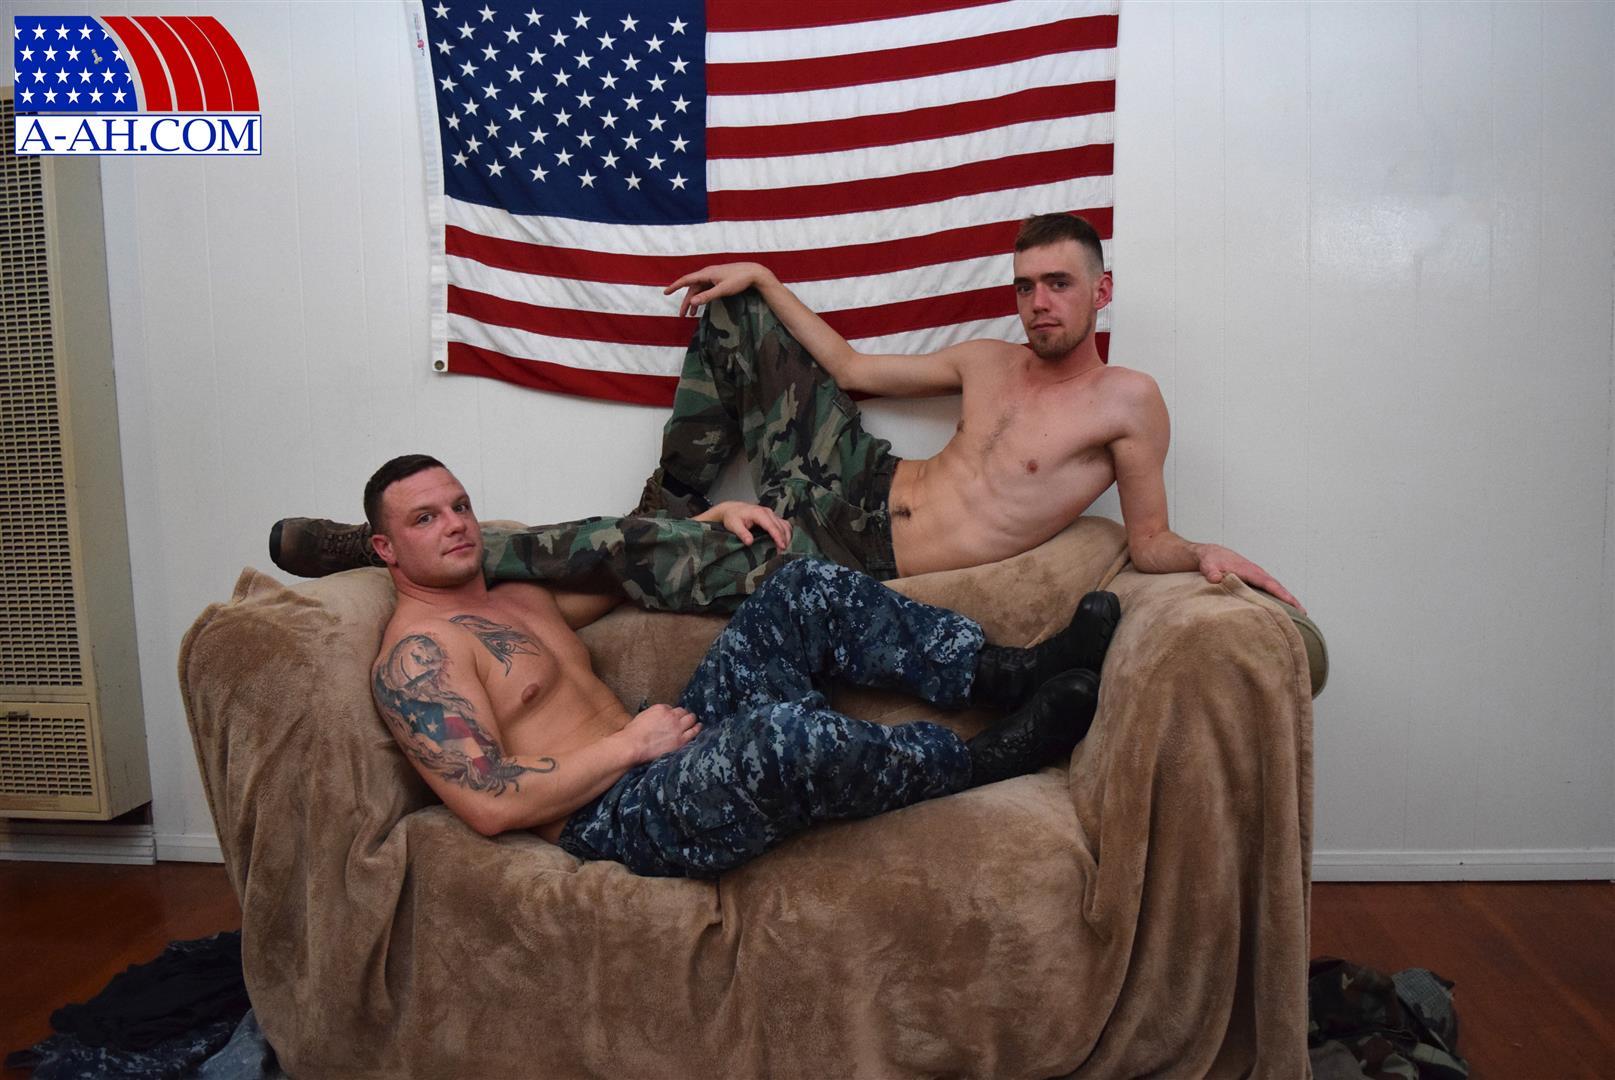 All-American-Heroes-Naked-Marine-Gets-Fucked-Bareback-Amateur-Gay-Porn-01 Army Corpsman Barebacks A Marine Corp Staff Sergeant